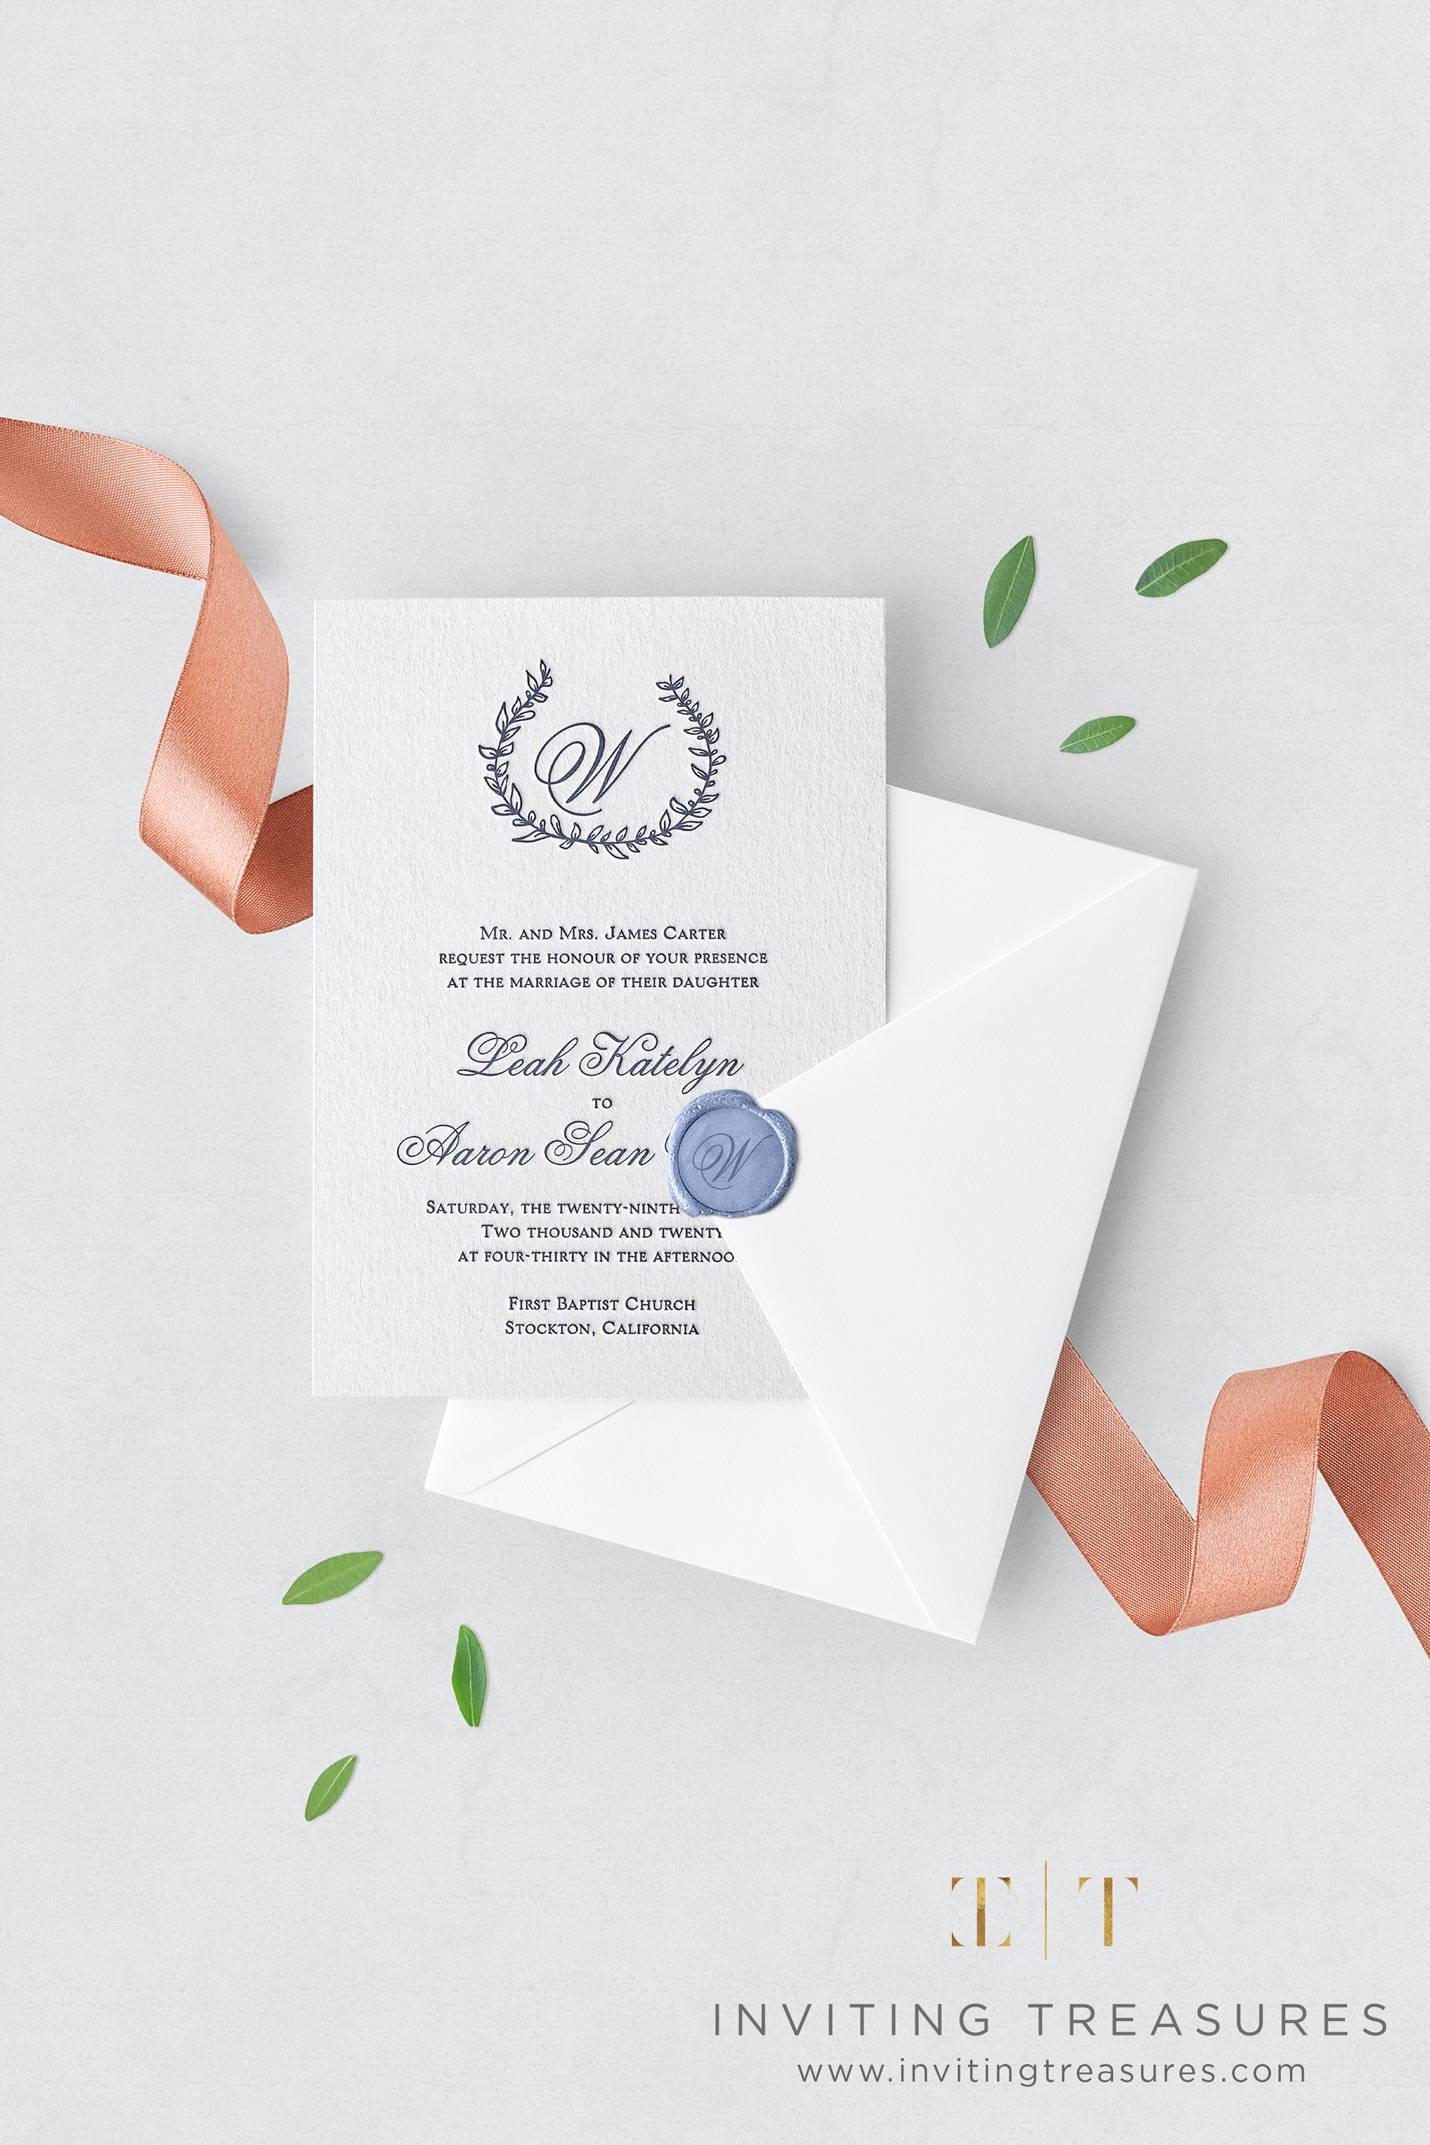 Whimsical Day Wedding Invitation